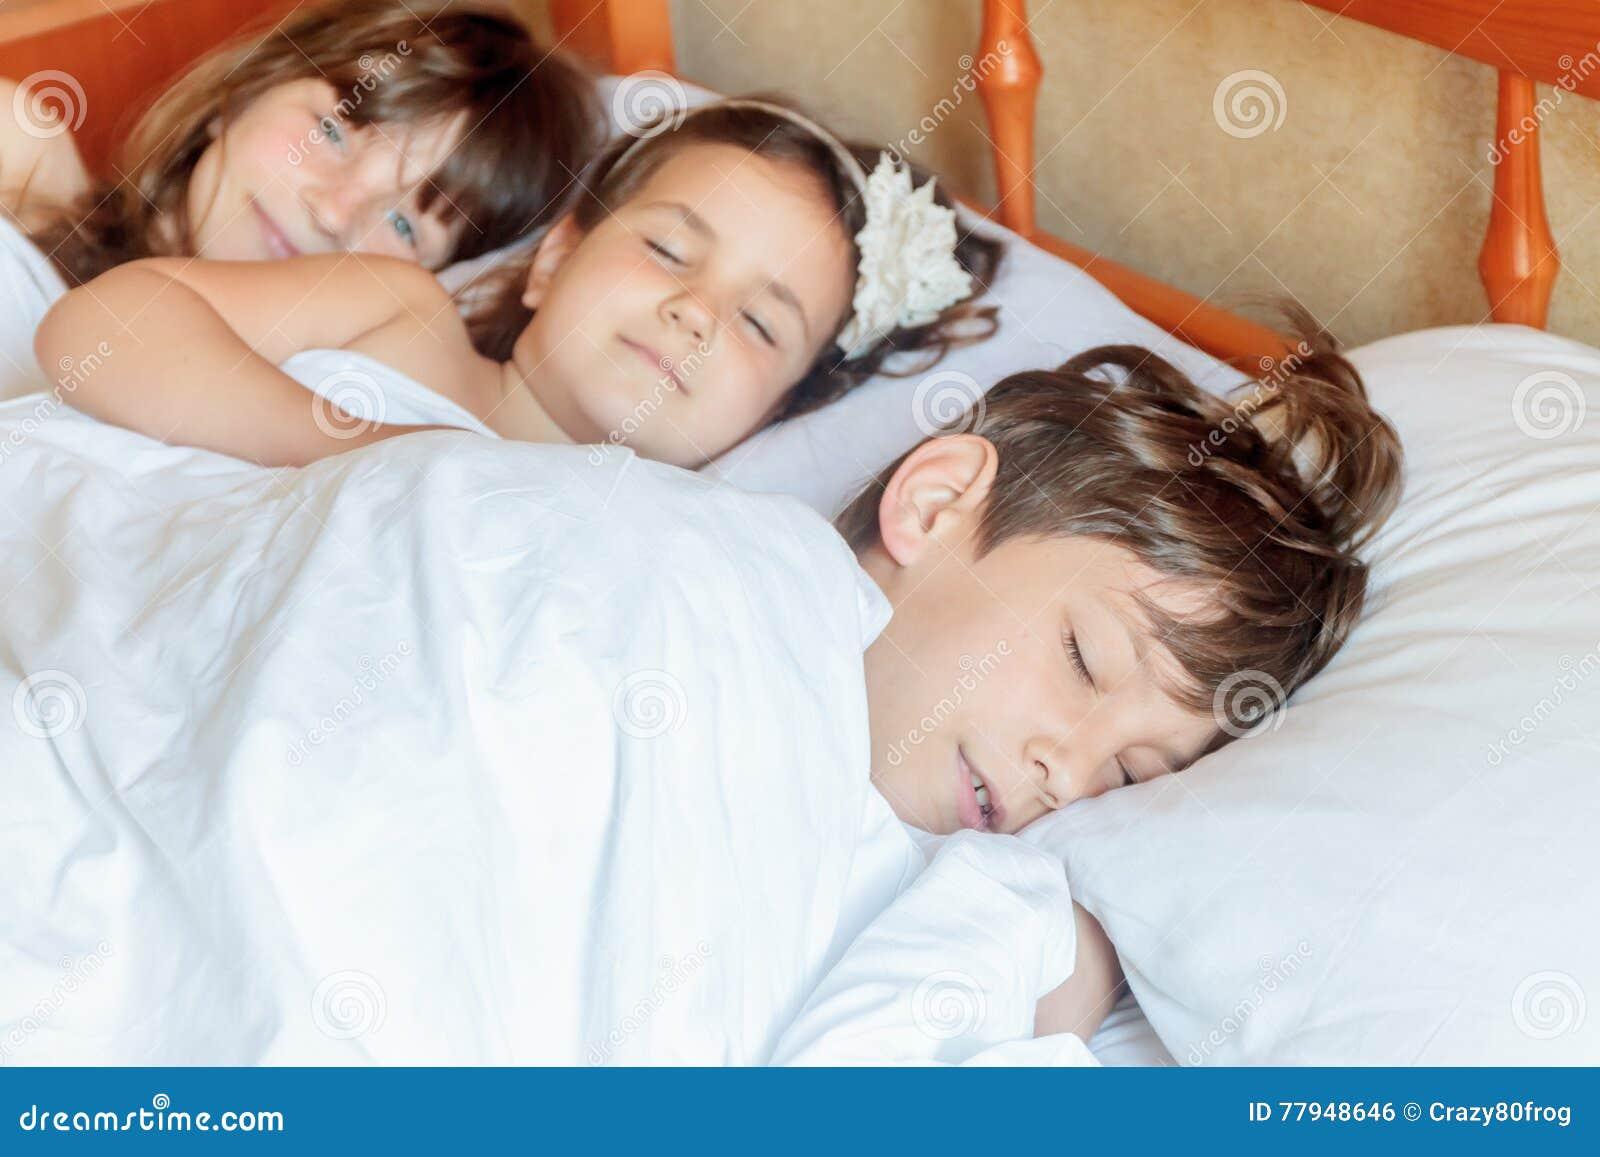 young little girls sleeping naked